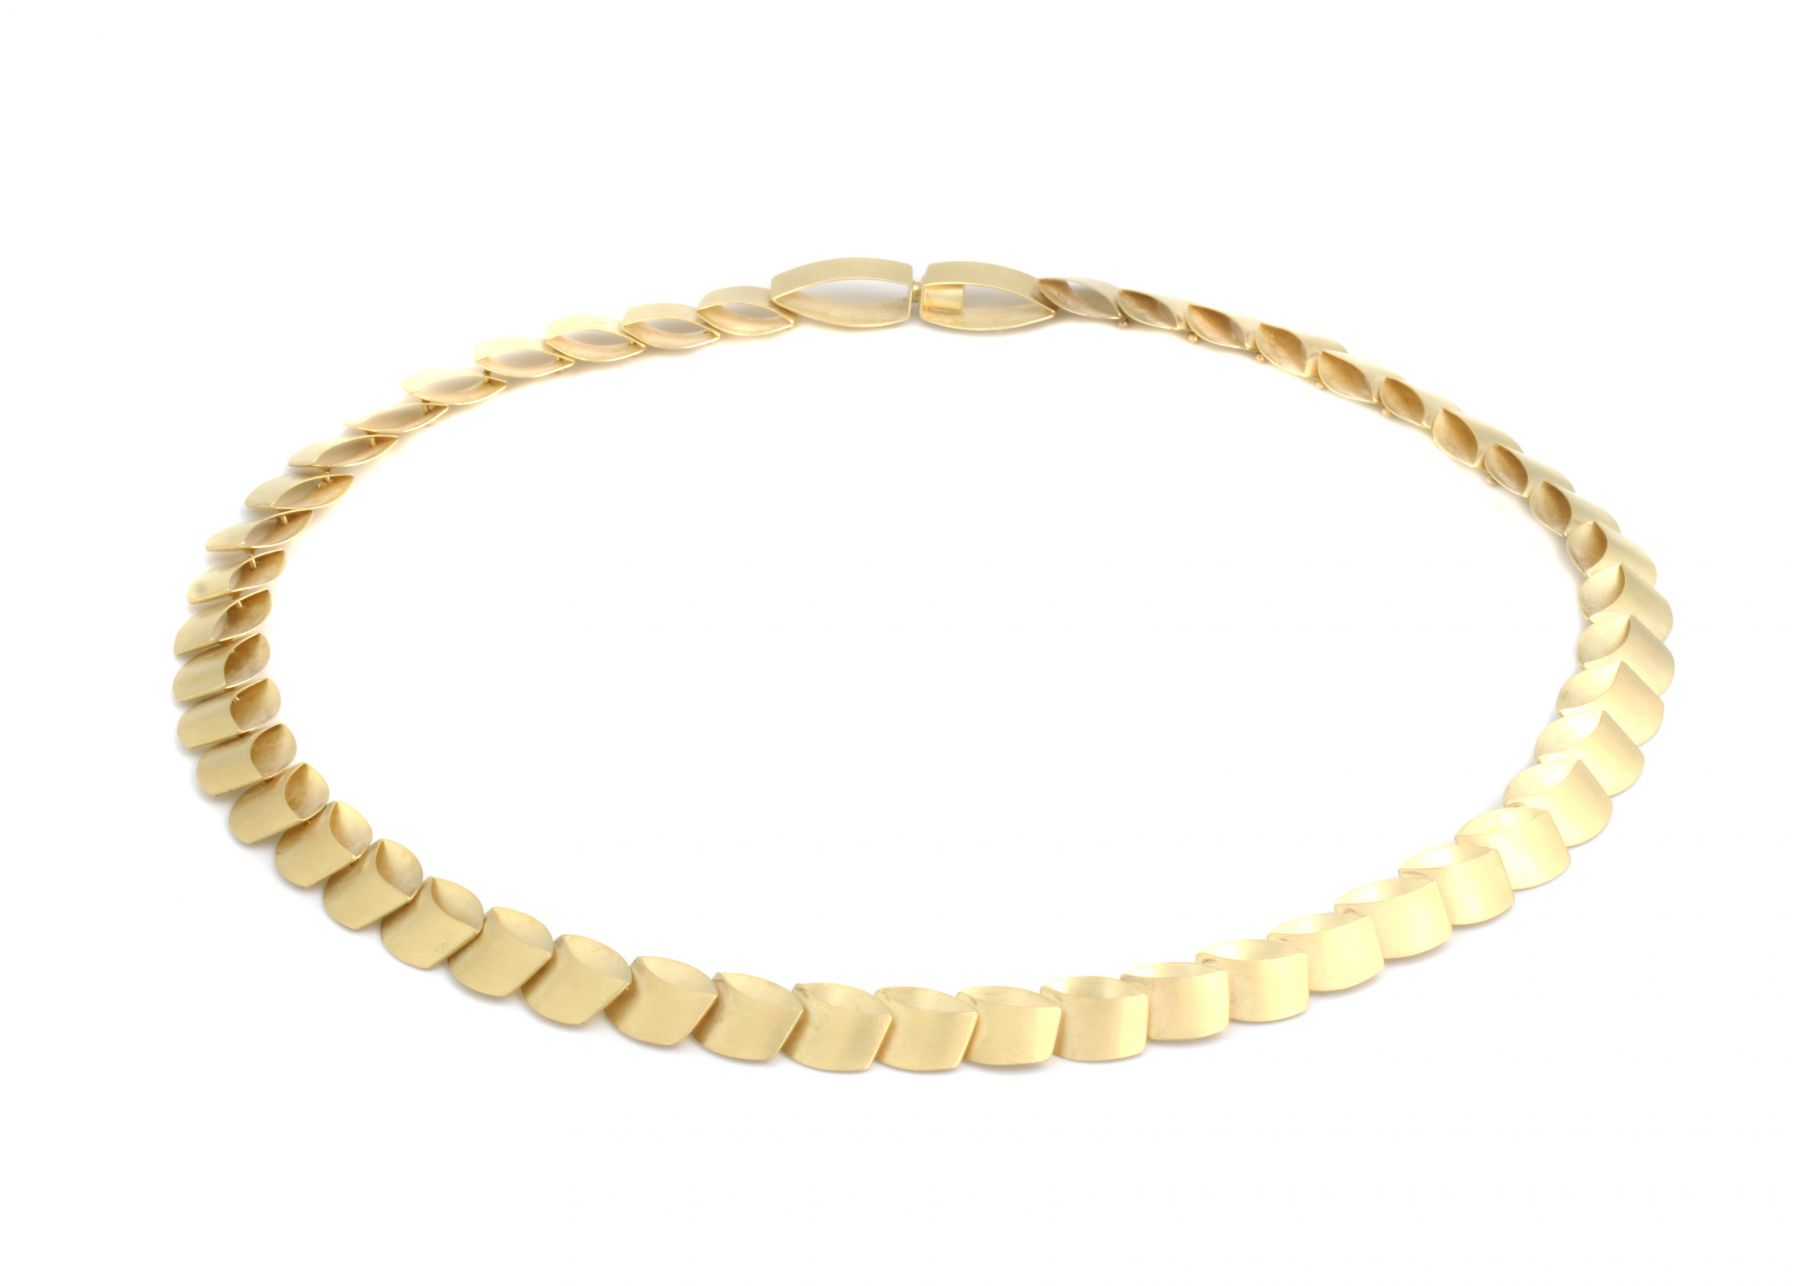 Dorothee Striffler, gold necklace